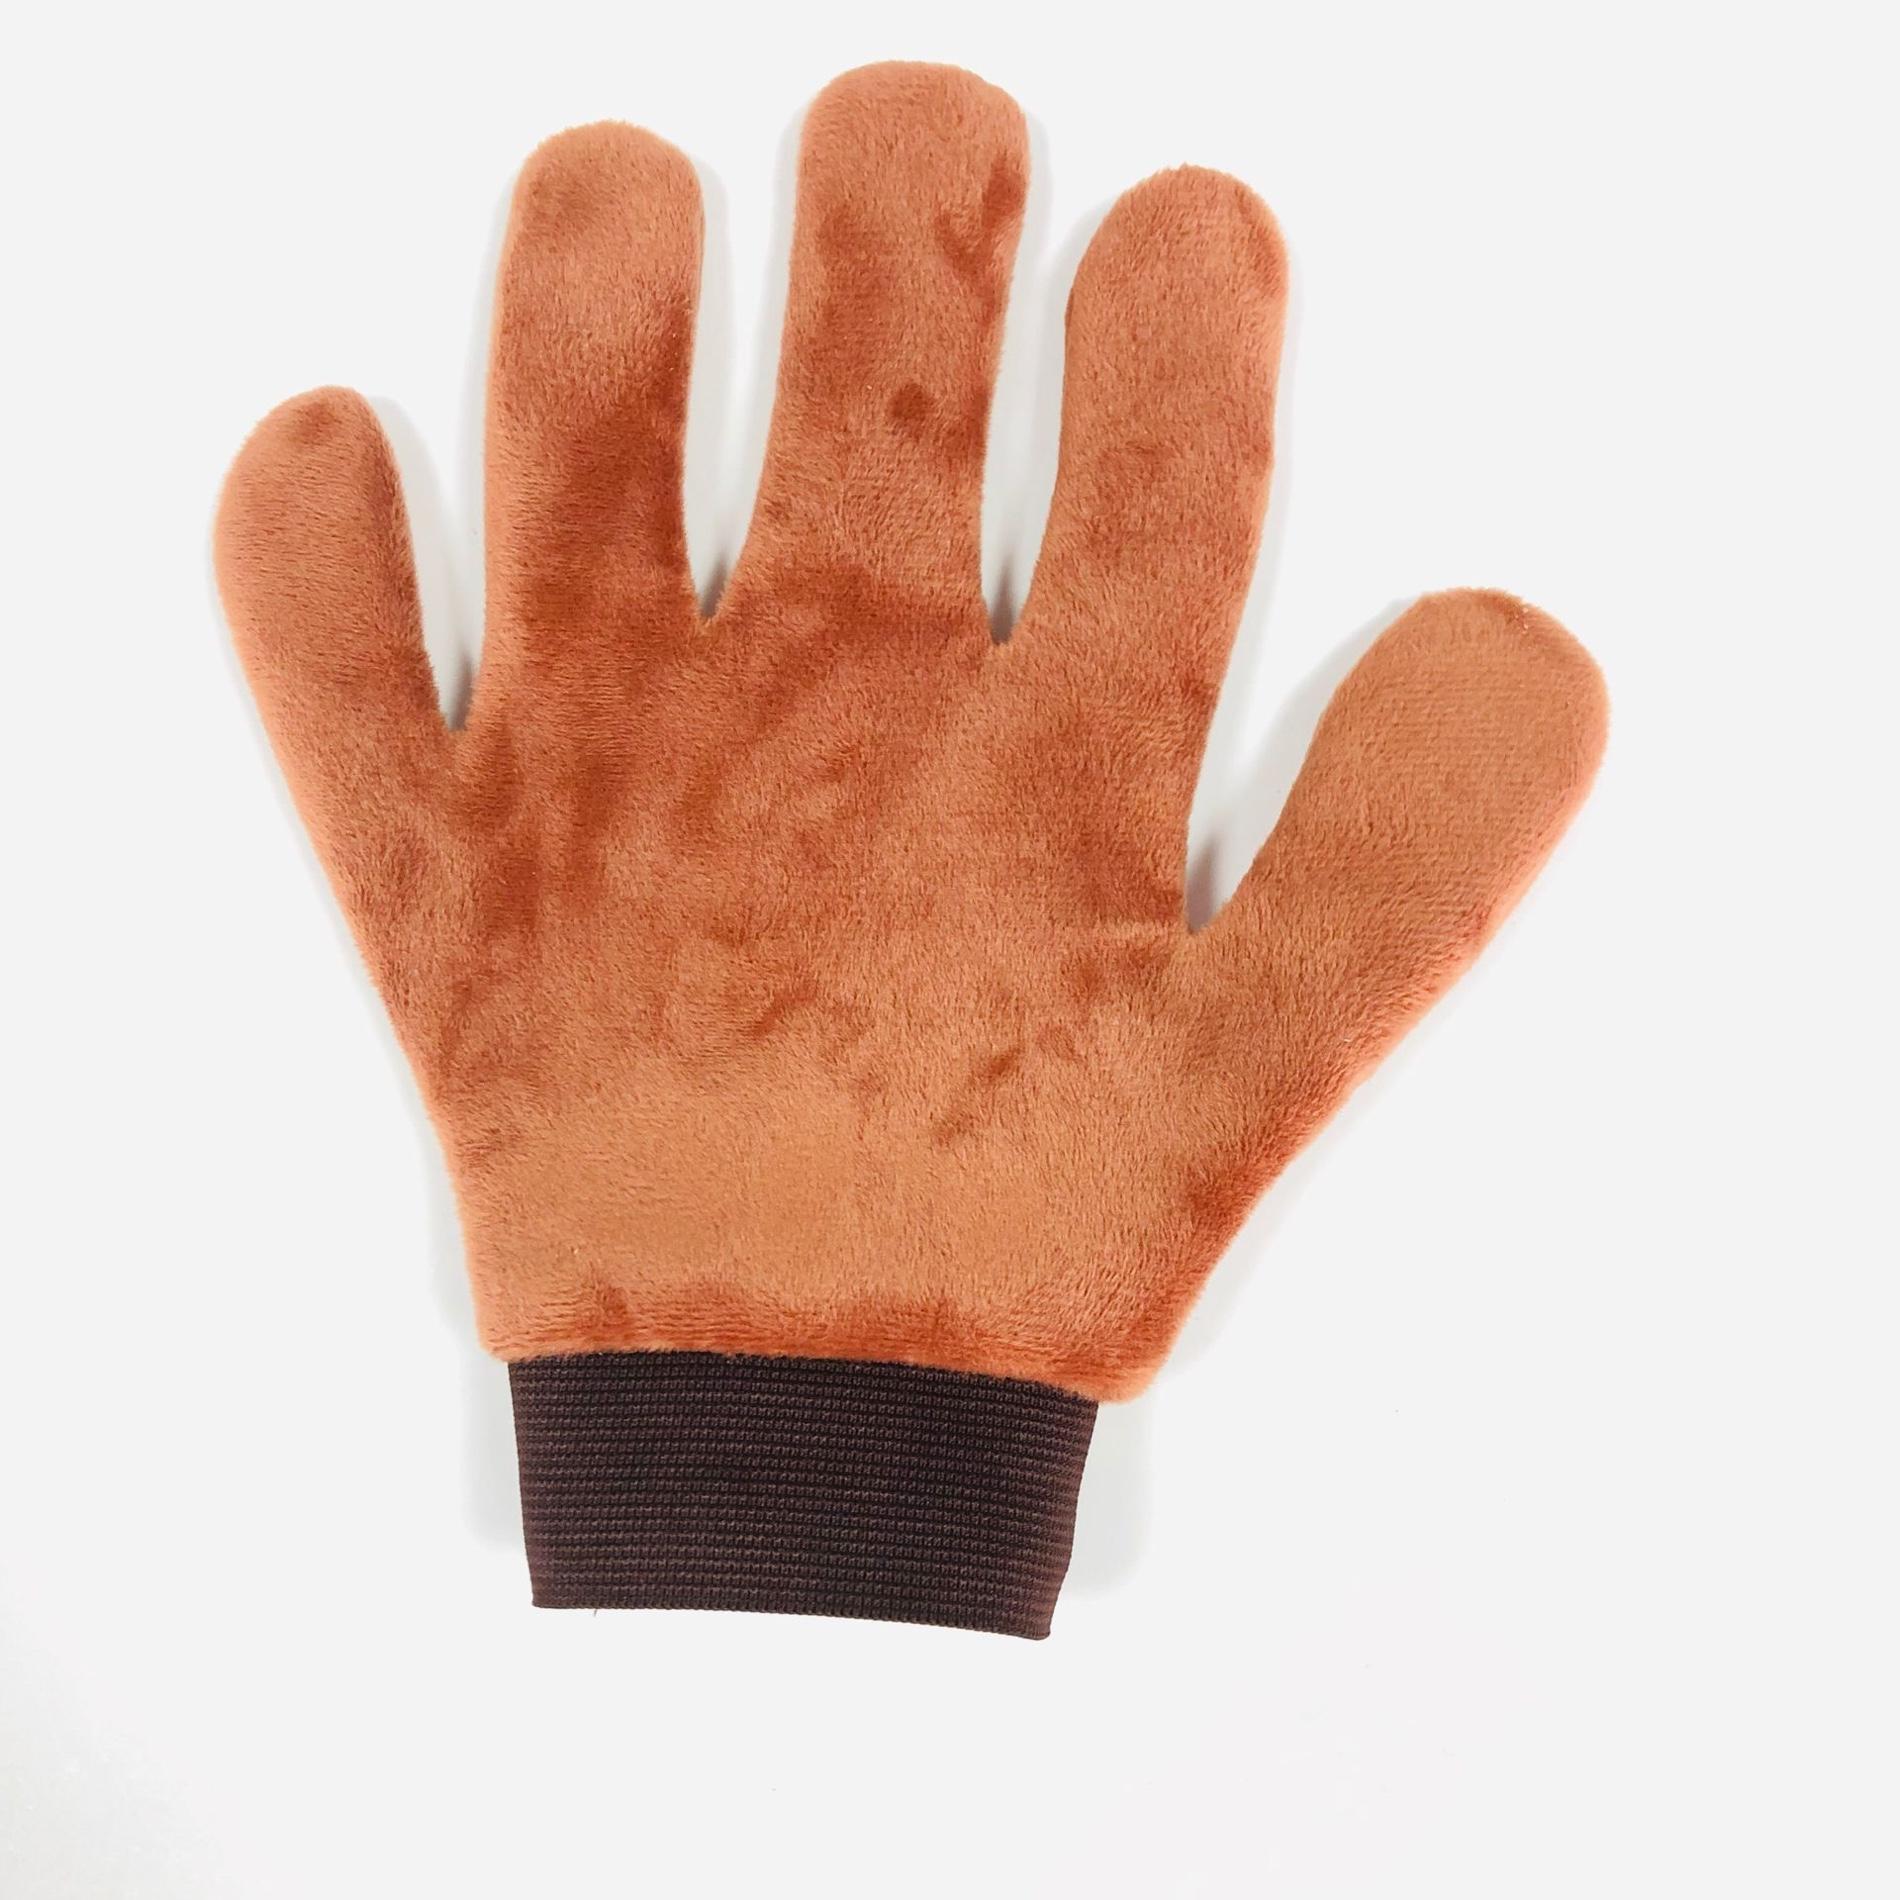 5 Fingers Microfiber Self Tanning Applicator Gloves